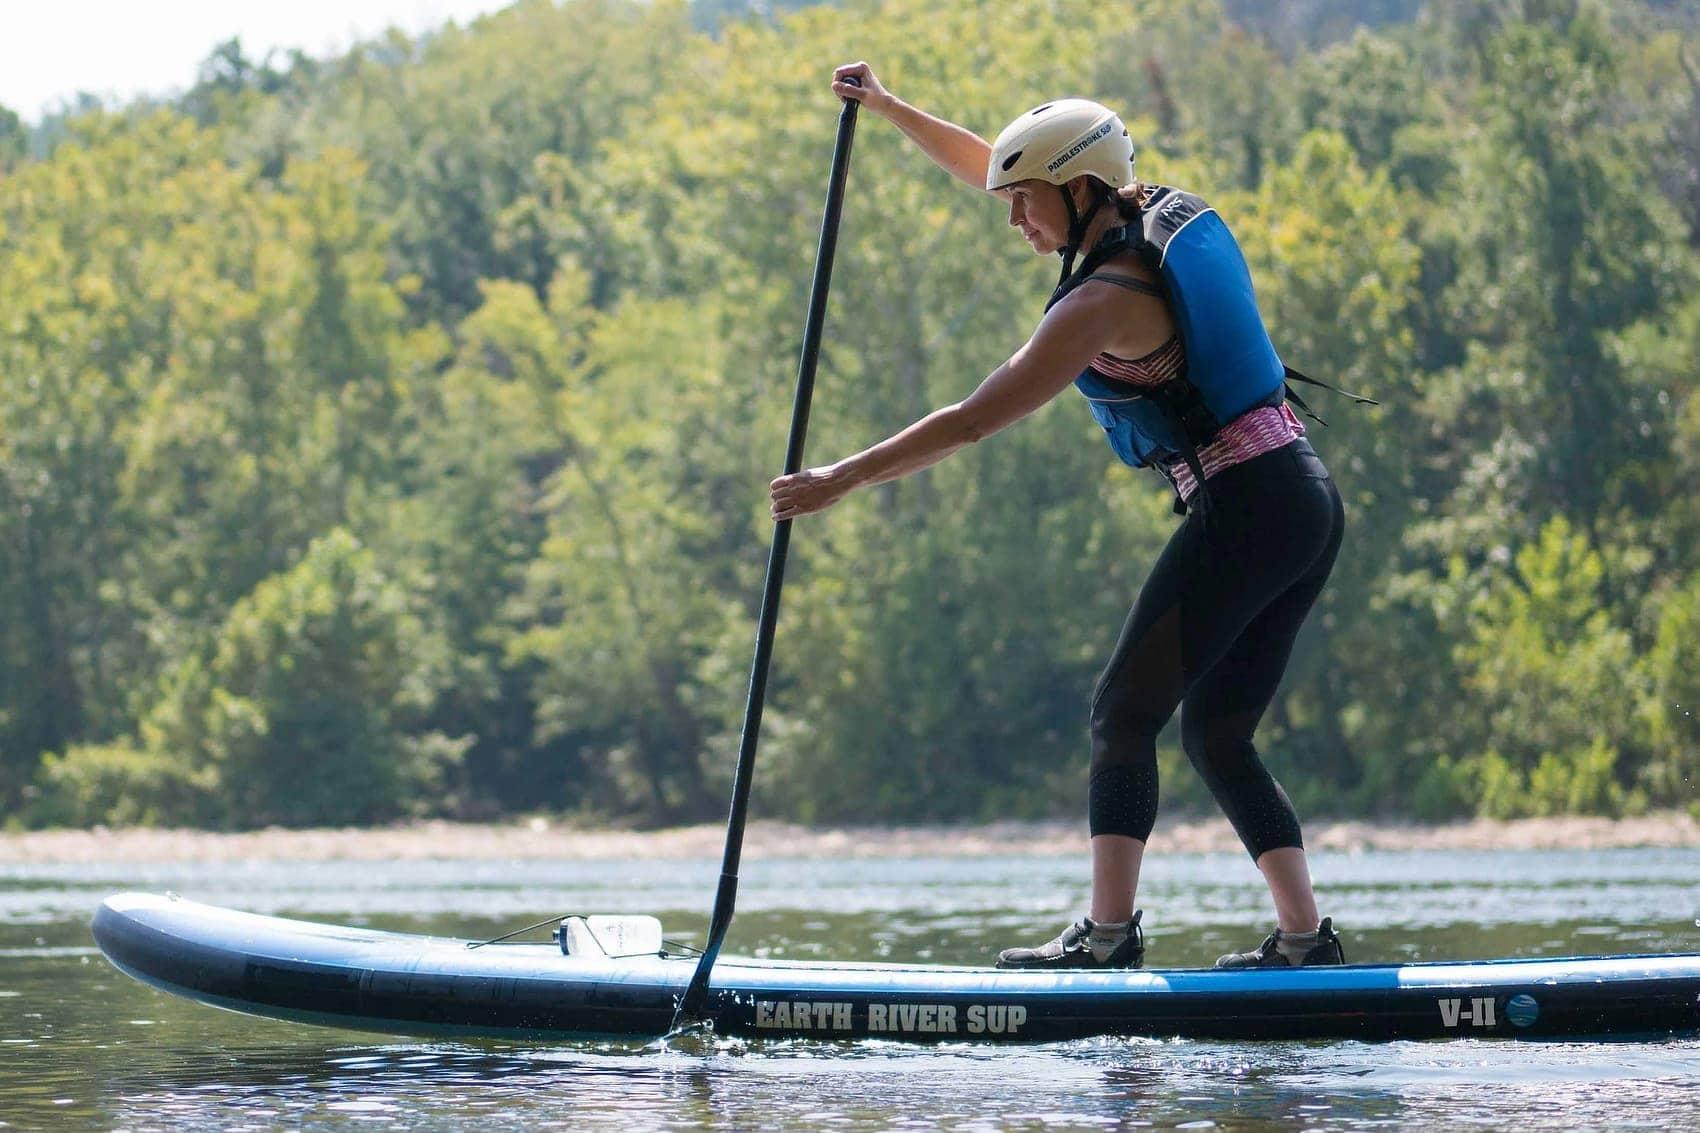 Earth River SUP12-6 V3 Paddle Board